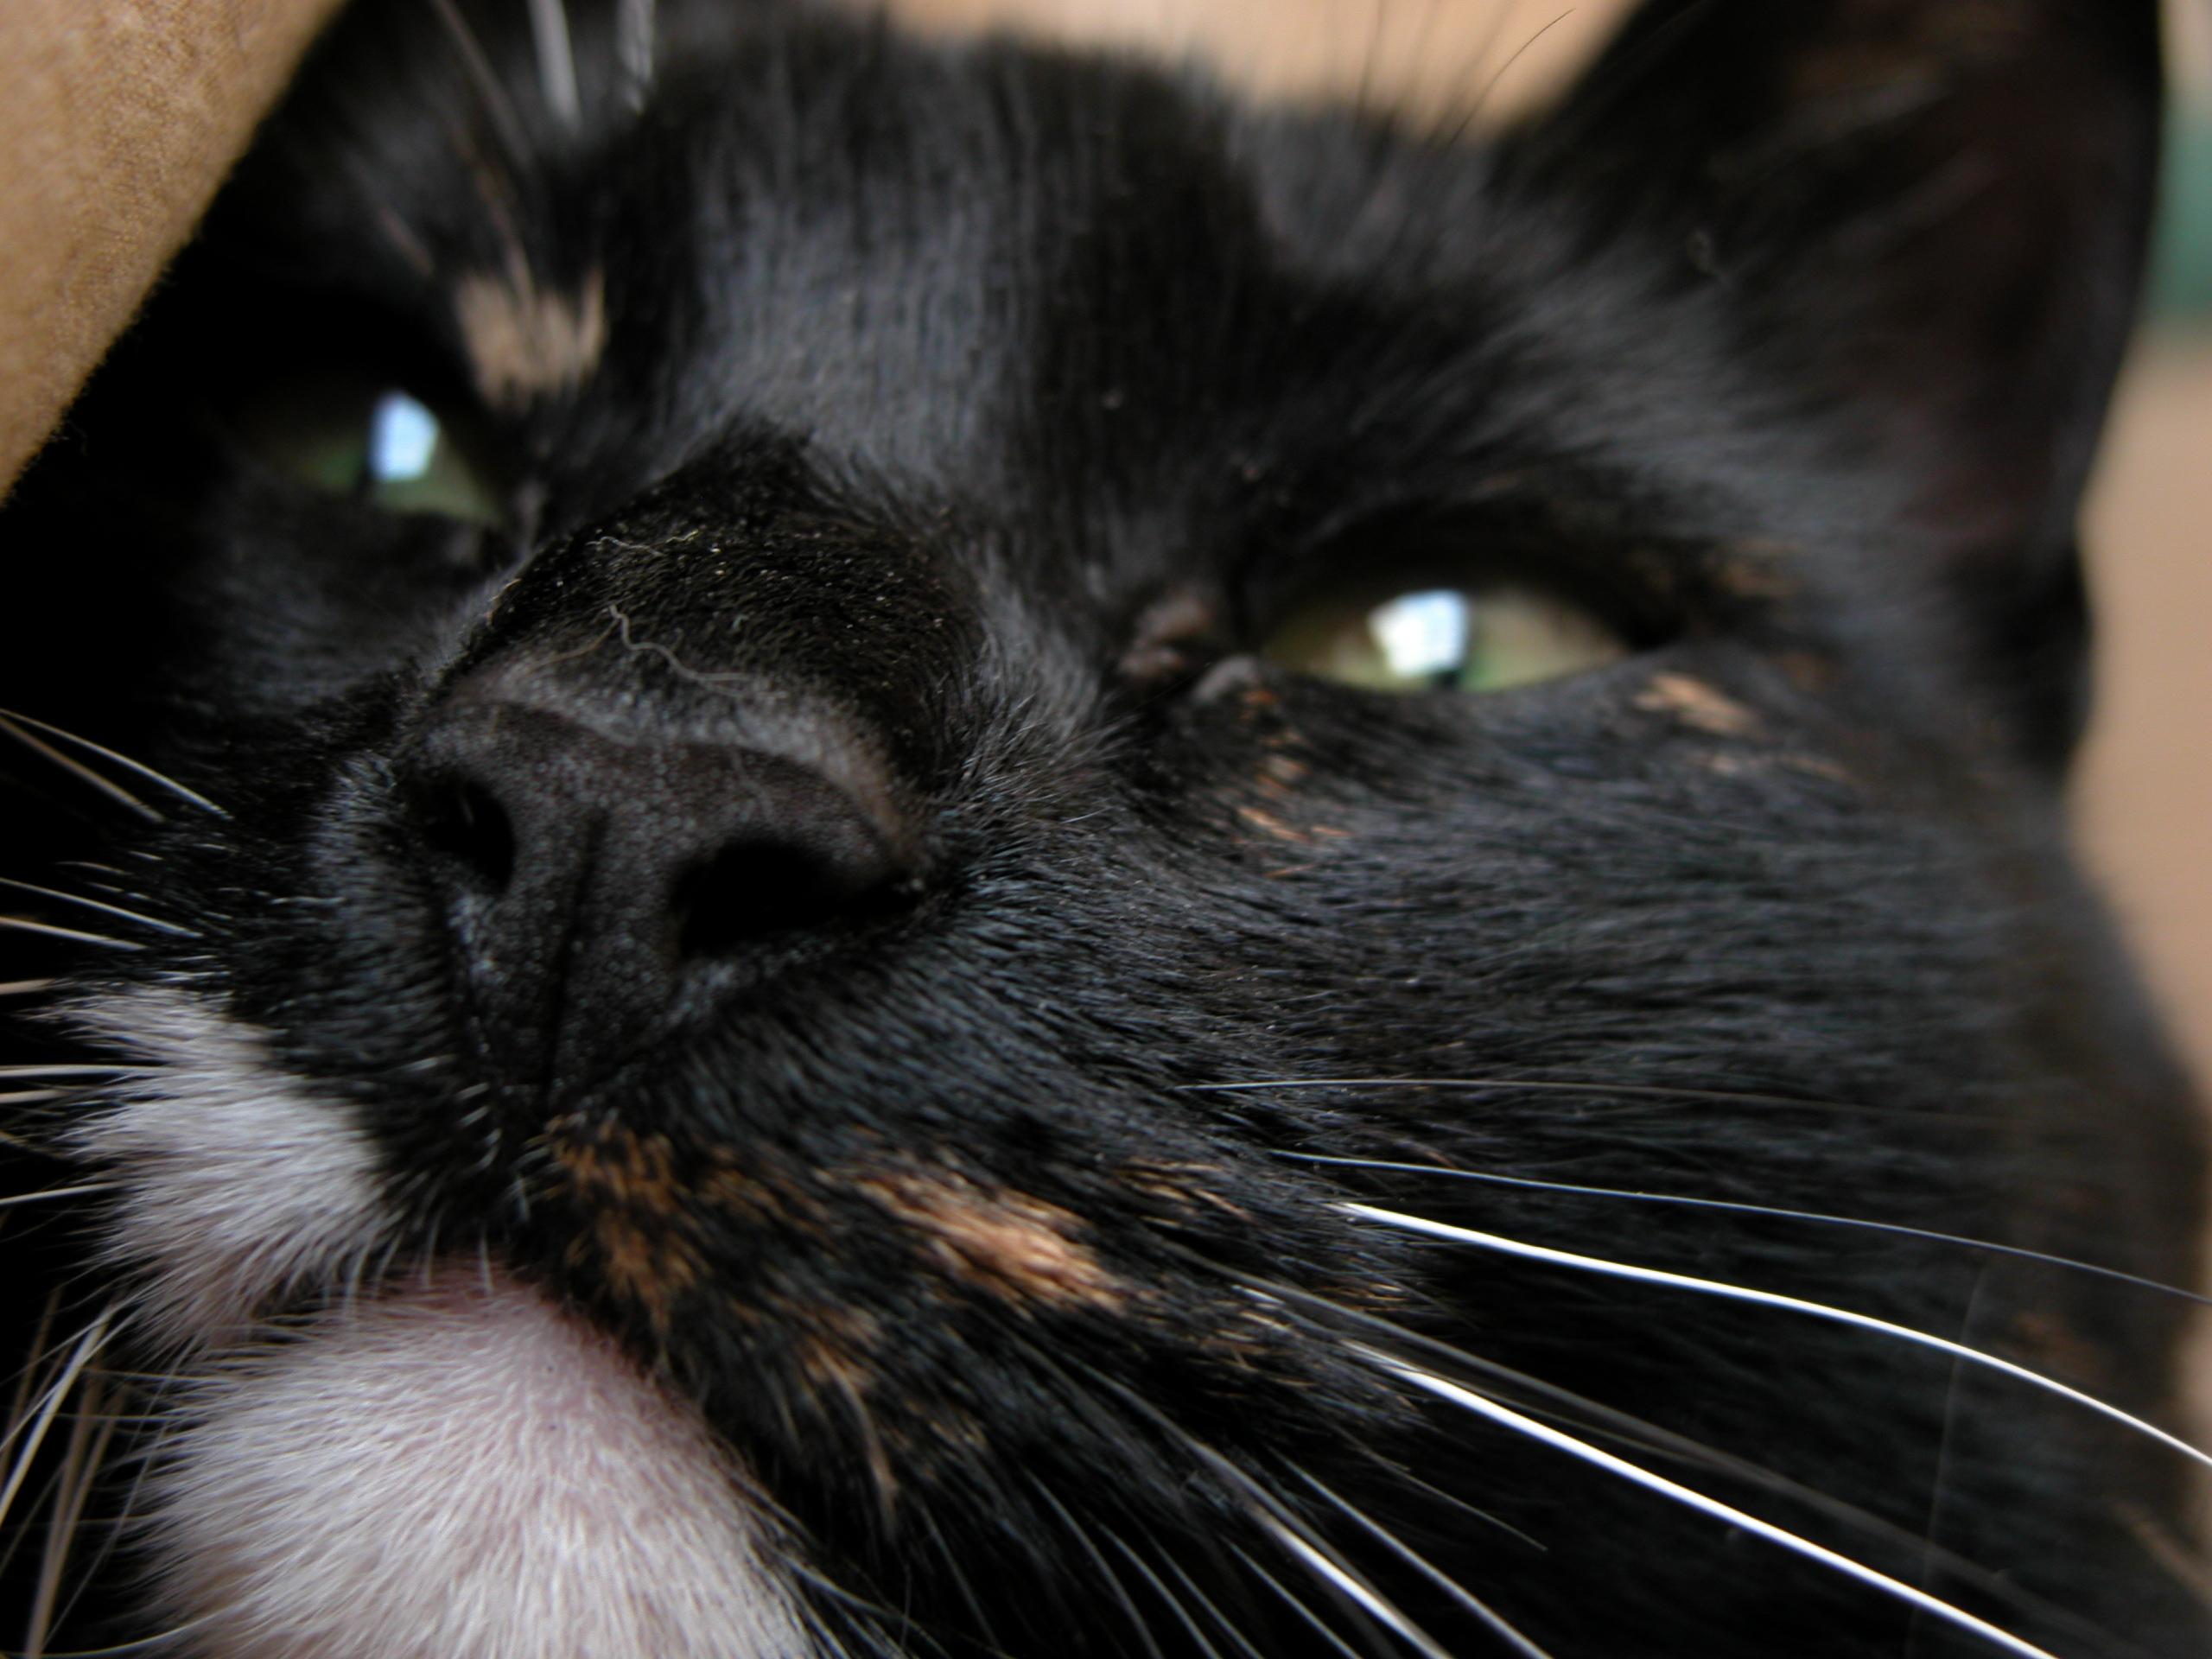 cat black and white cute head eye eyes closed green hair hairs fur royalty free